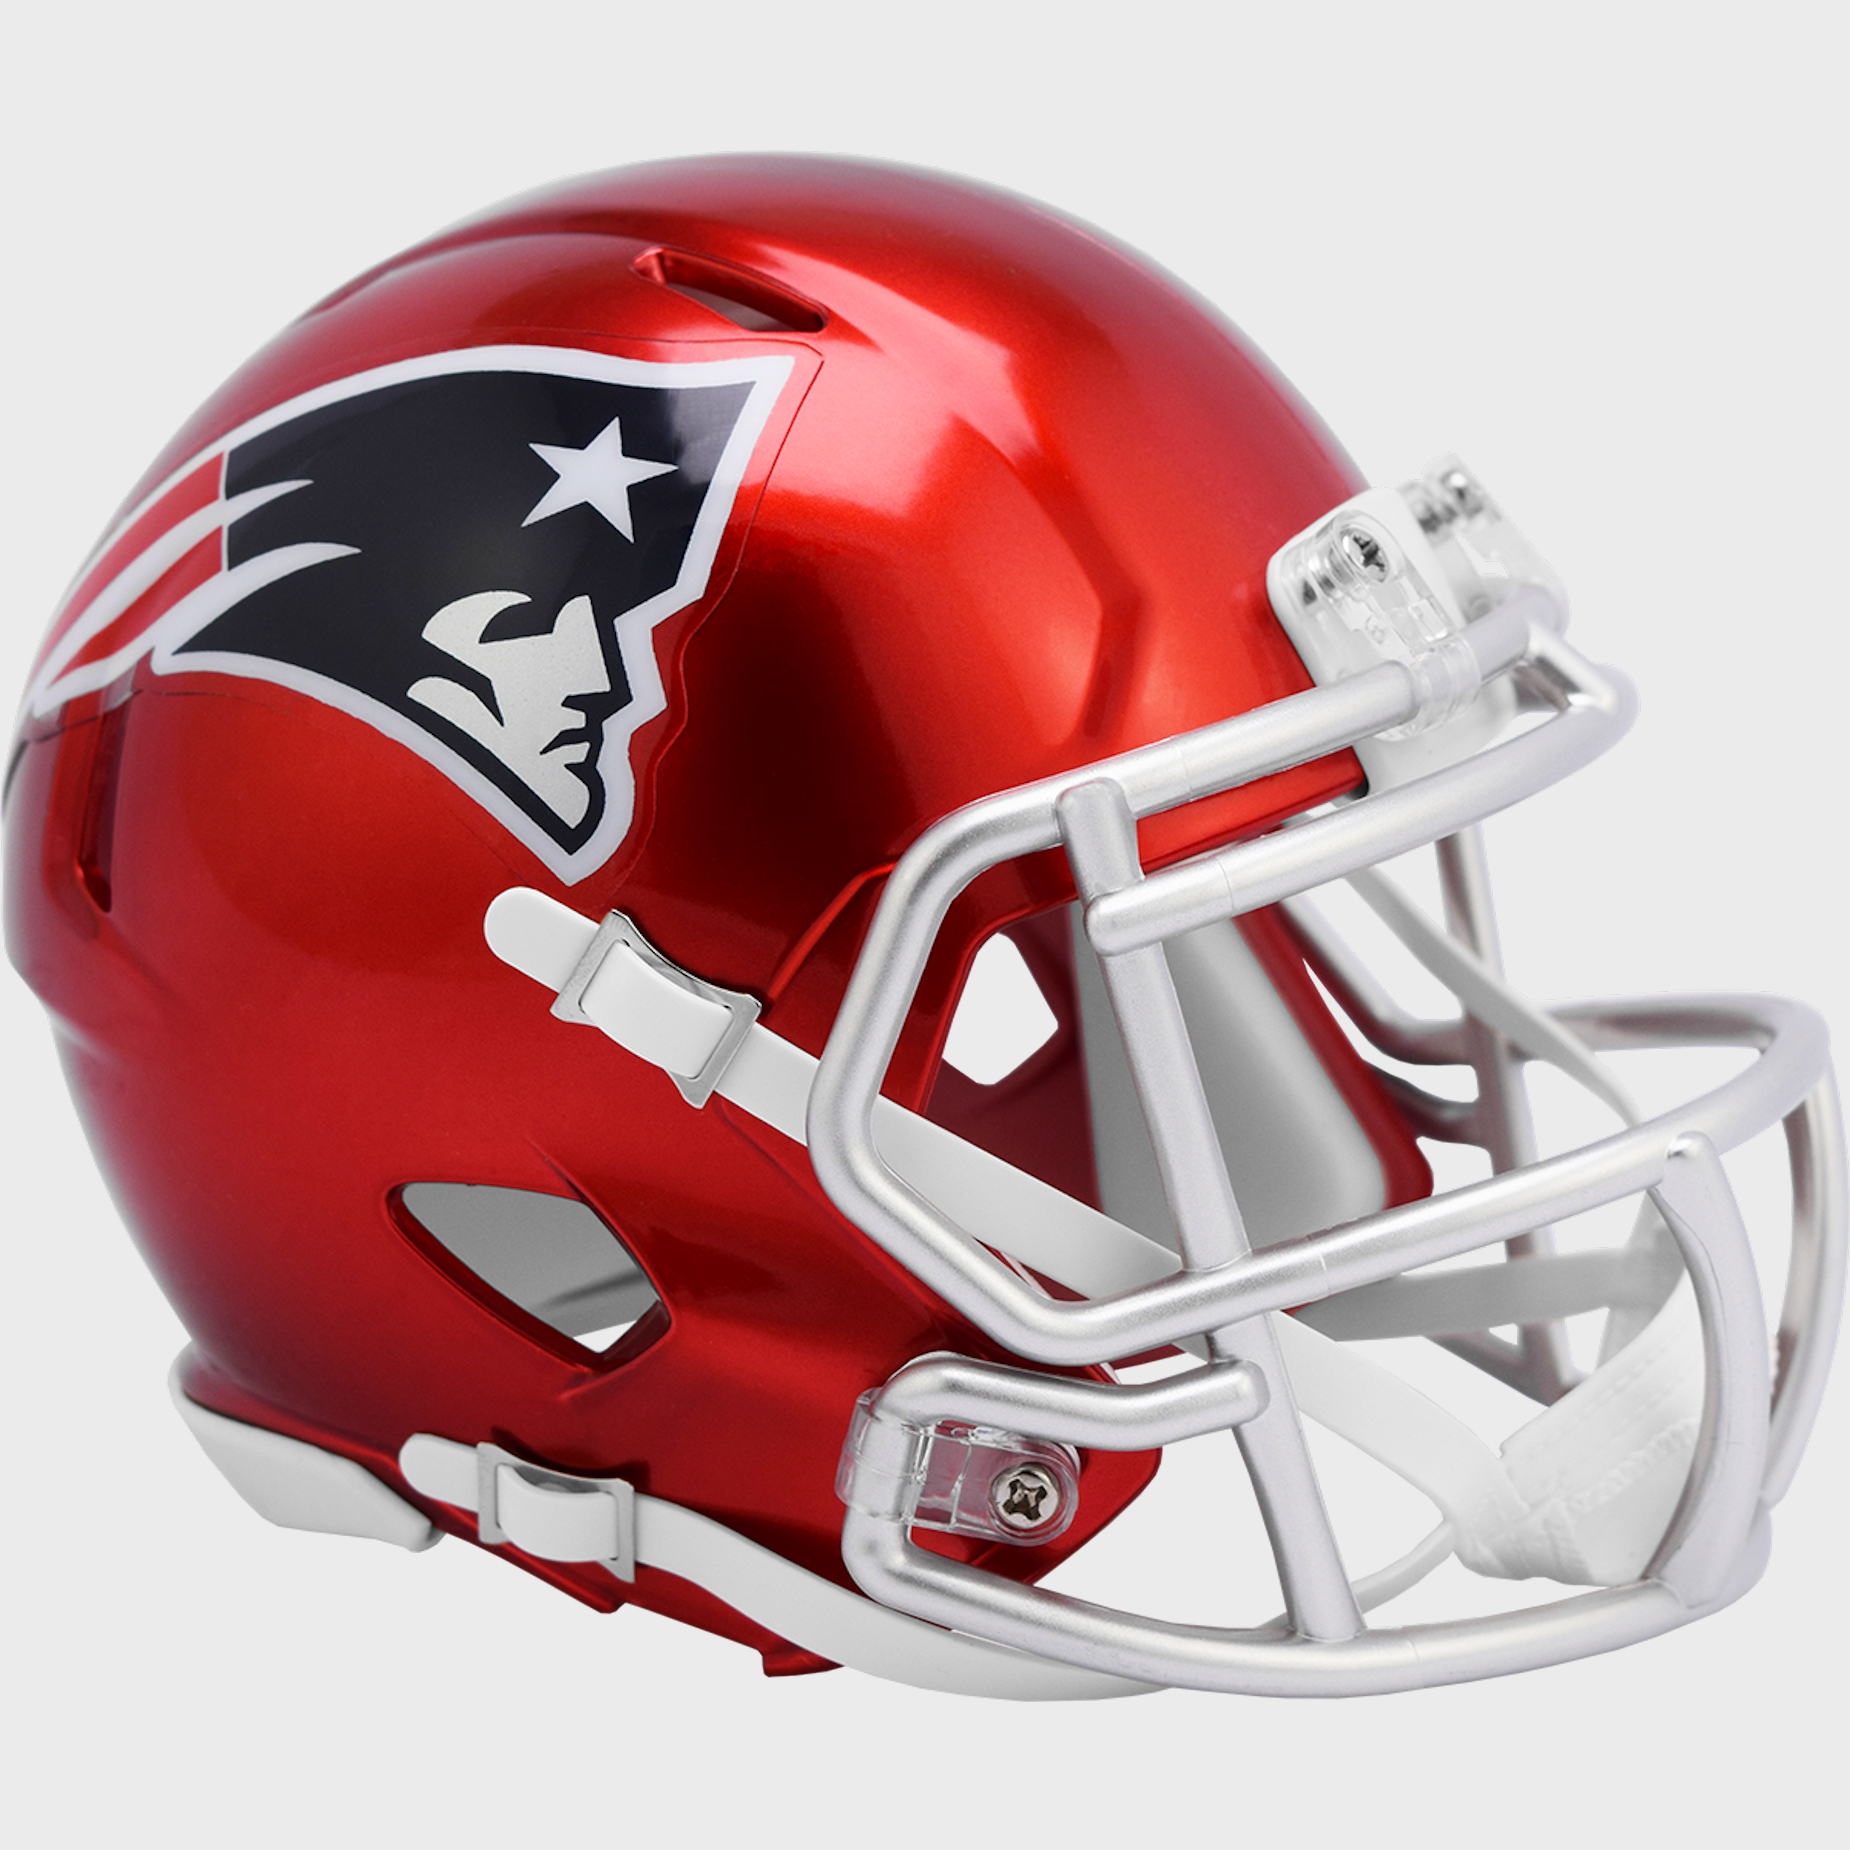 New England Patriots Speed Mini Football Helmet <B>FLASH ESD 8/21/21</B>